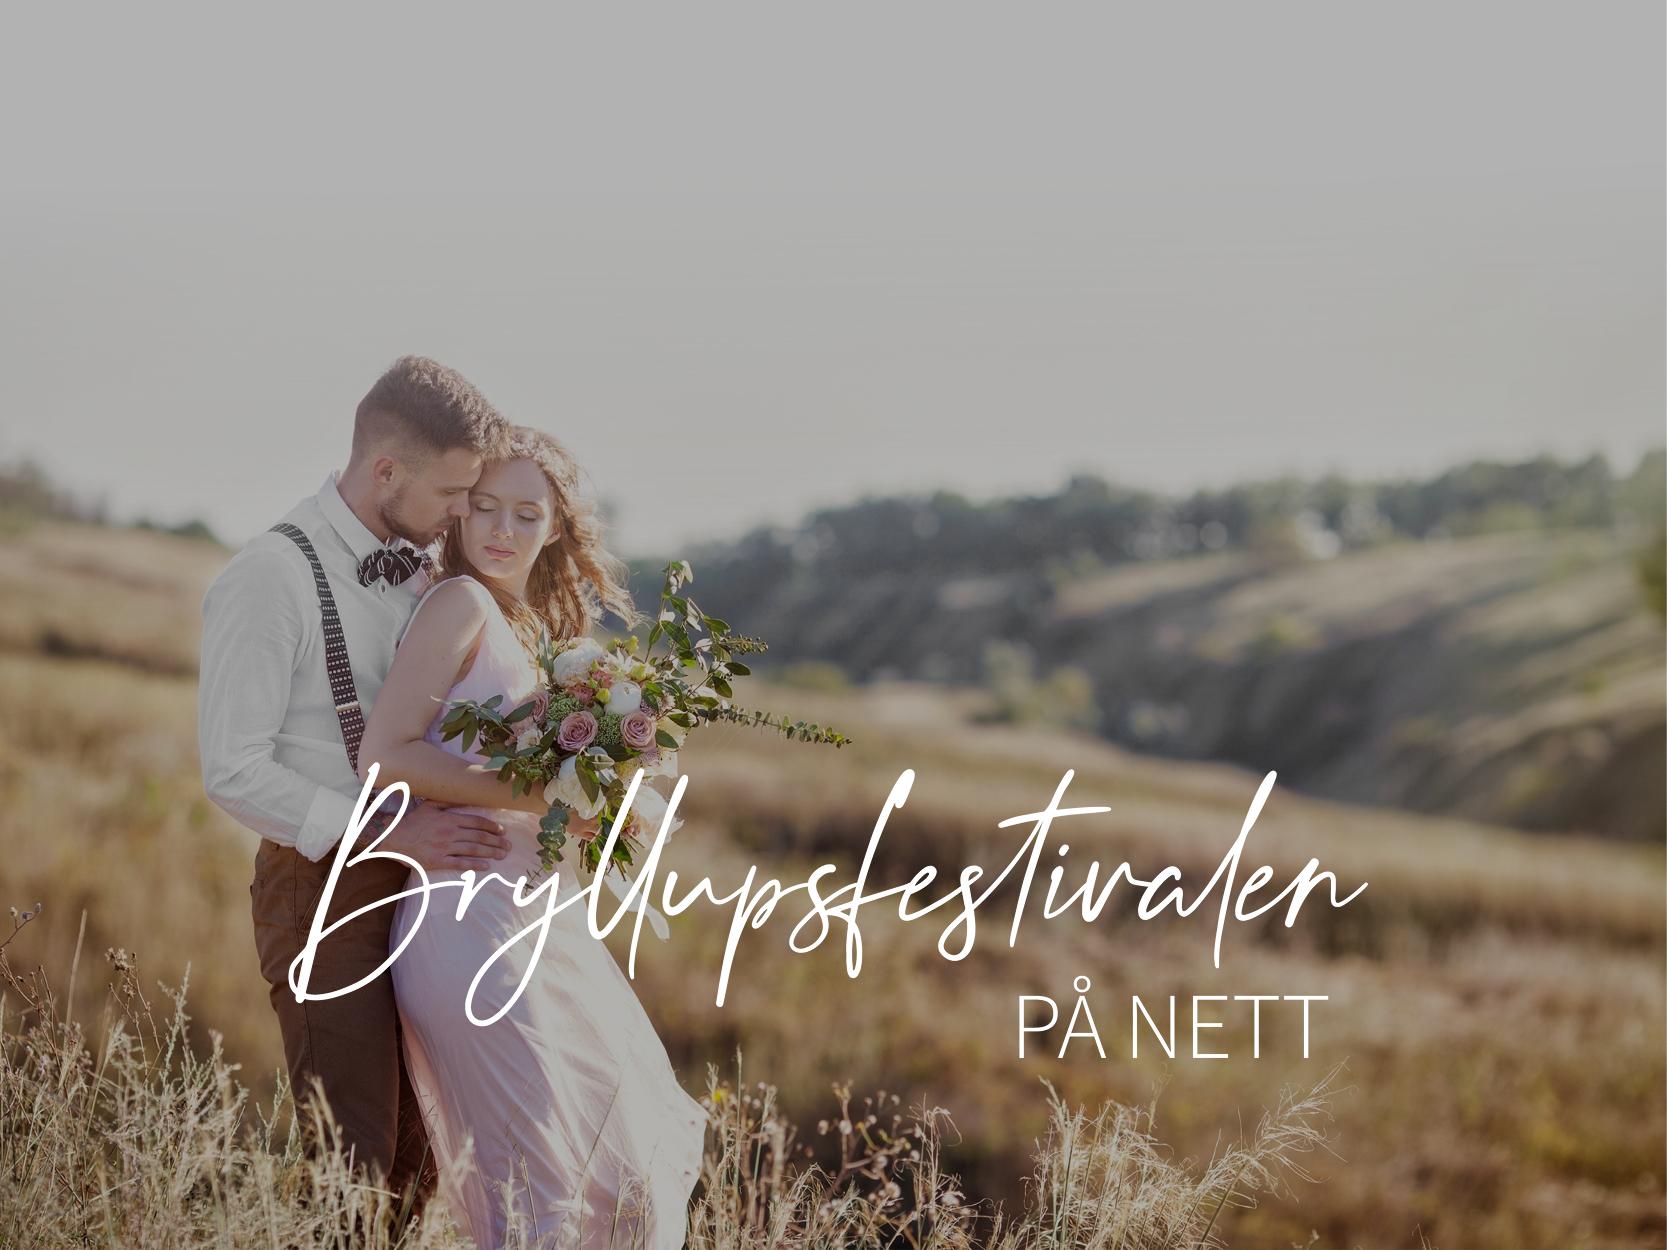 Banner Bryllupsfestivalen